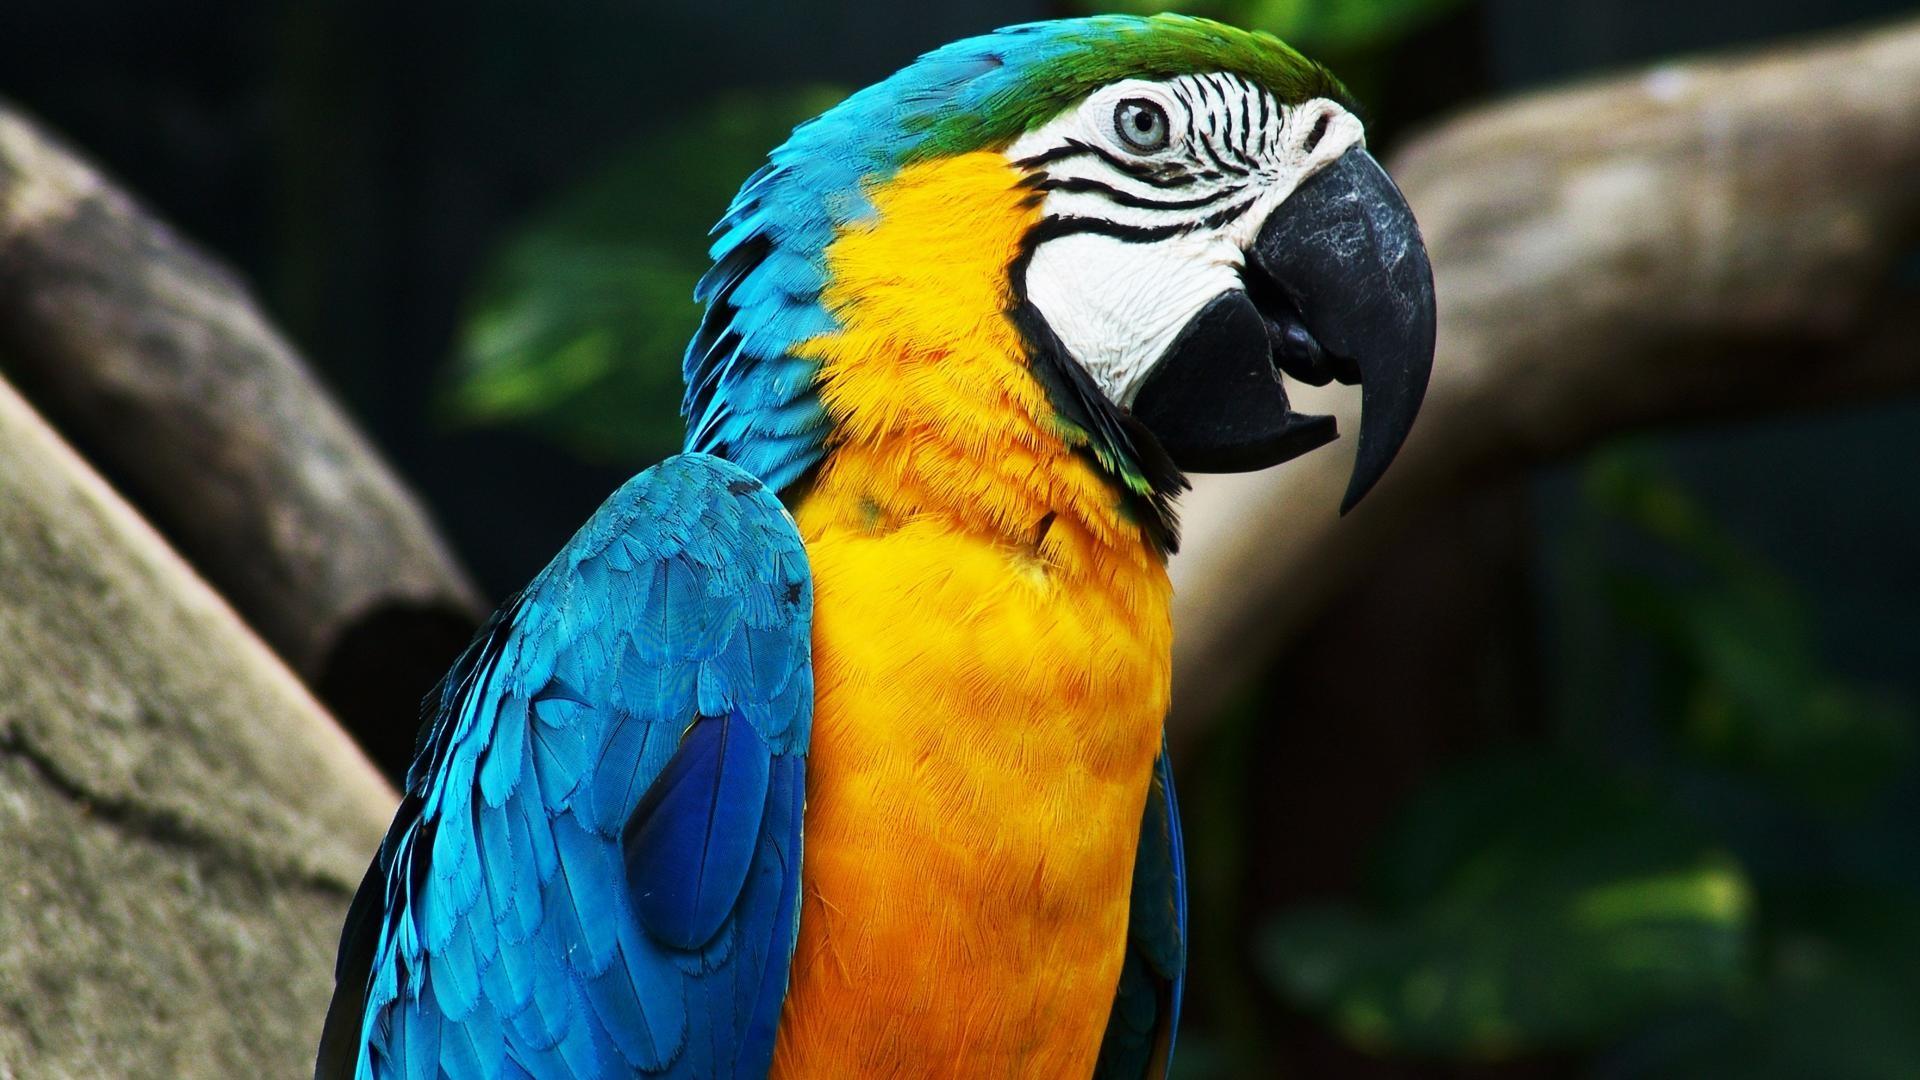 Volorful-parrot-animal-wallpaper-HD